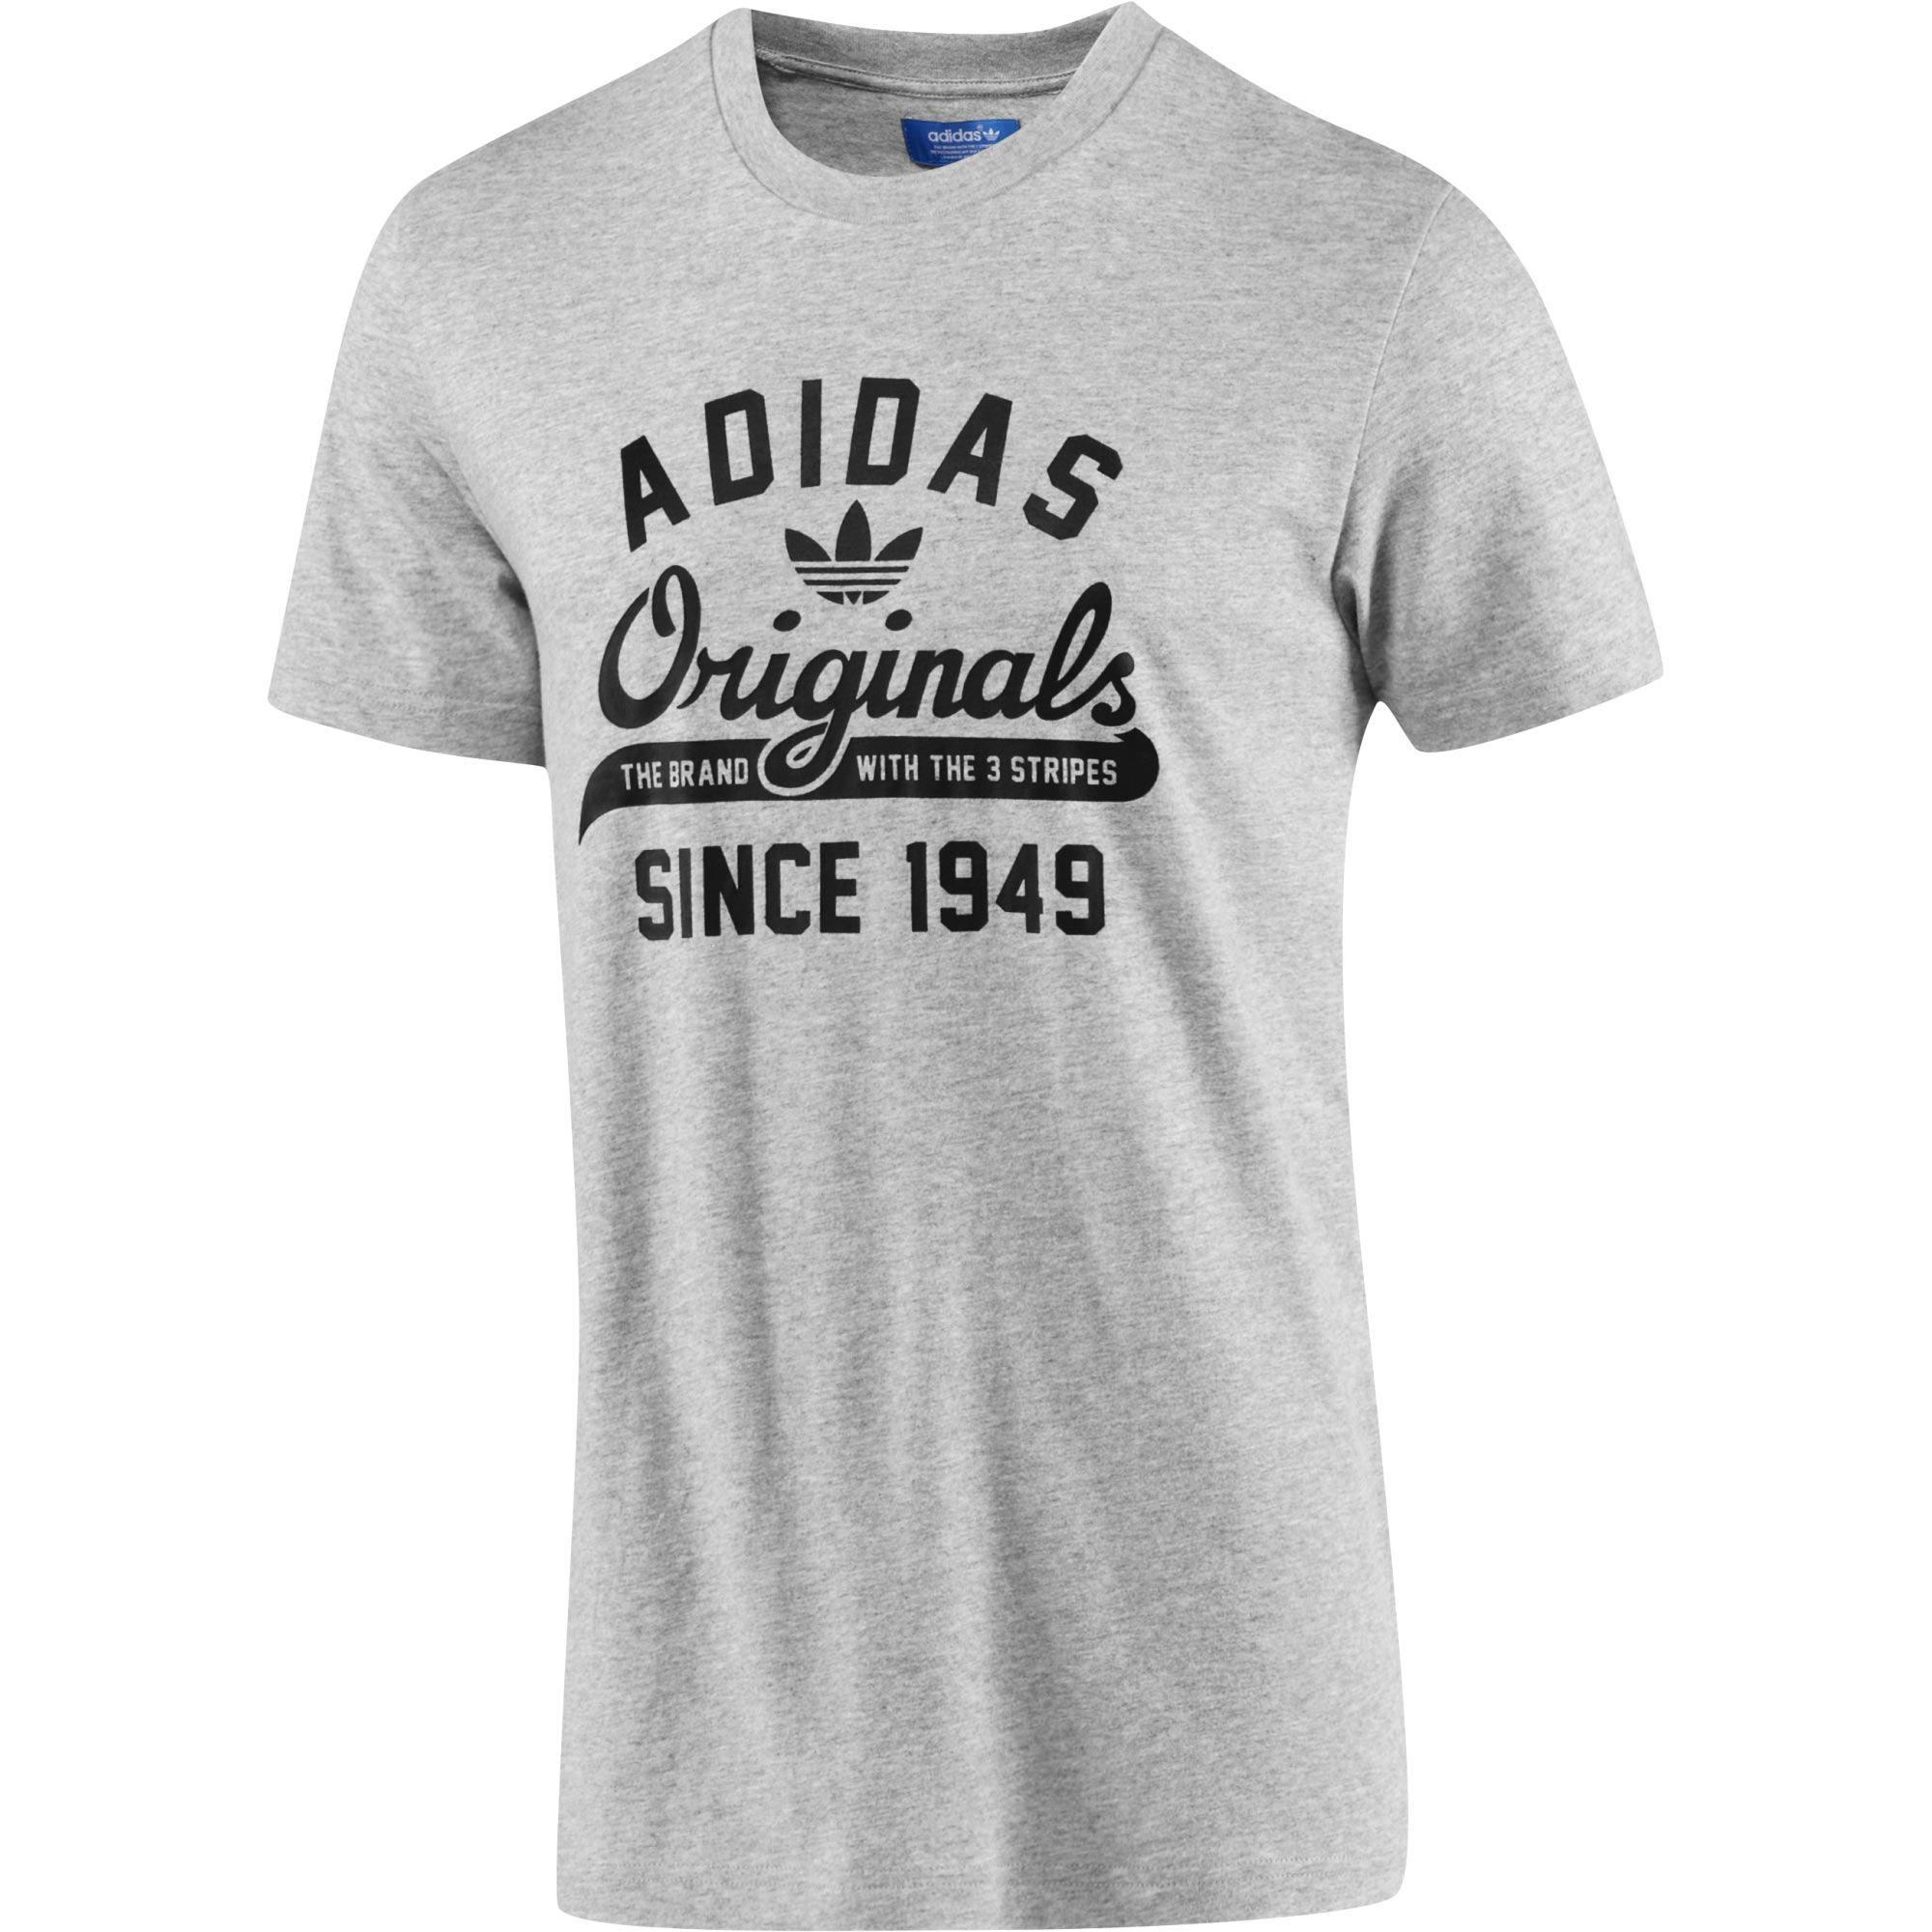 adidas original camisetas hombres